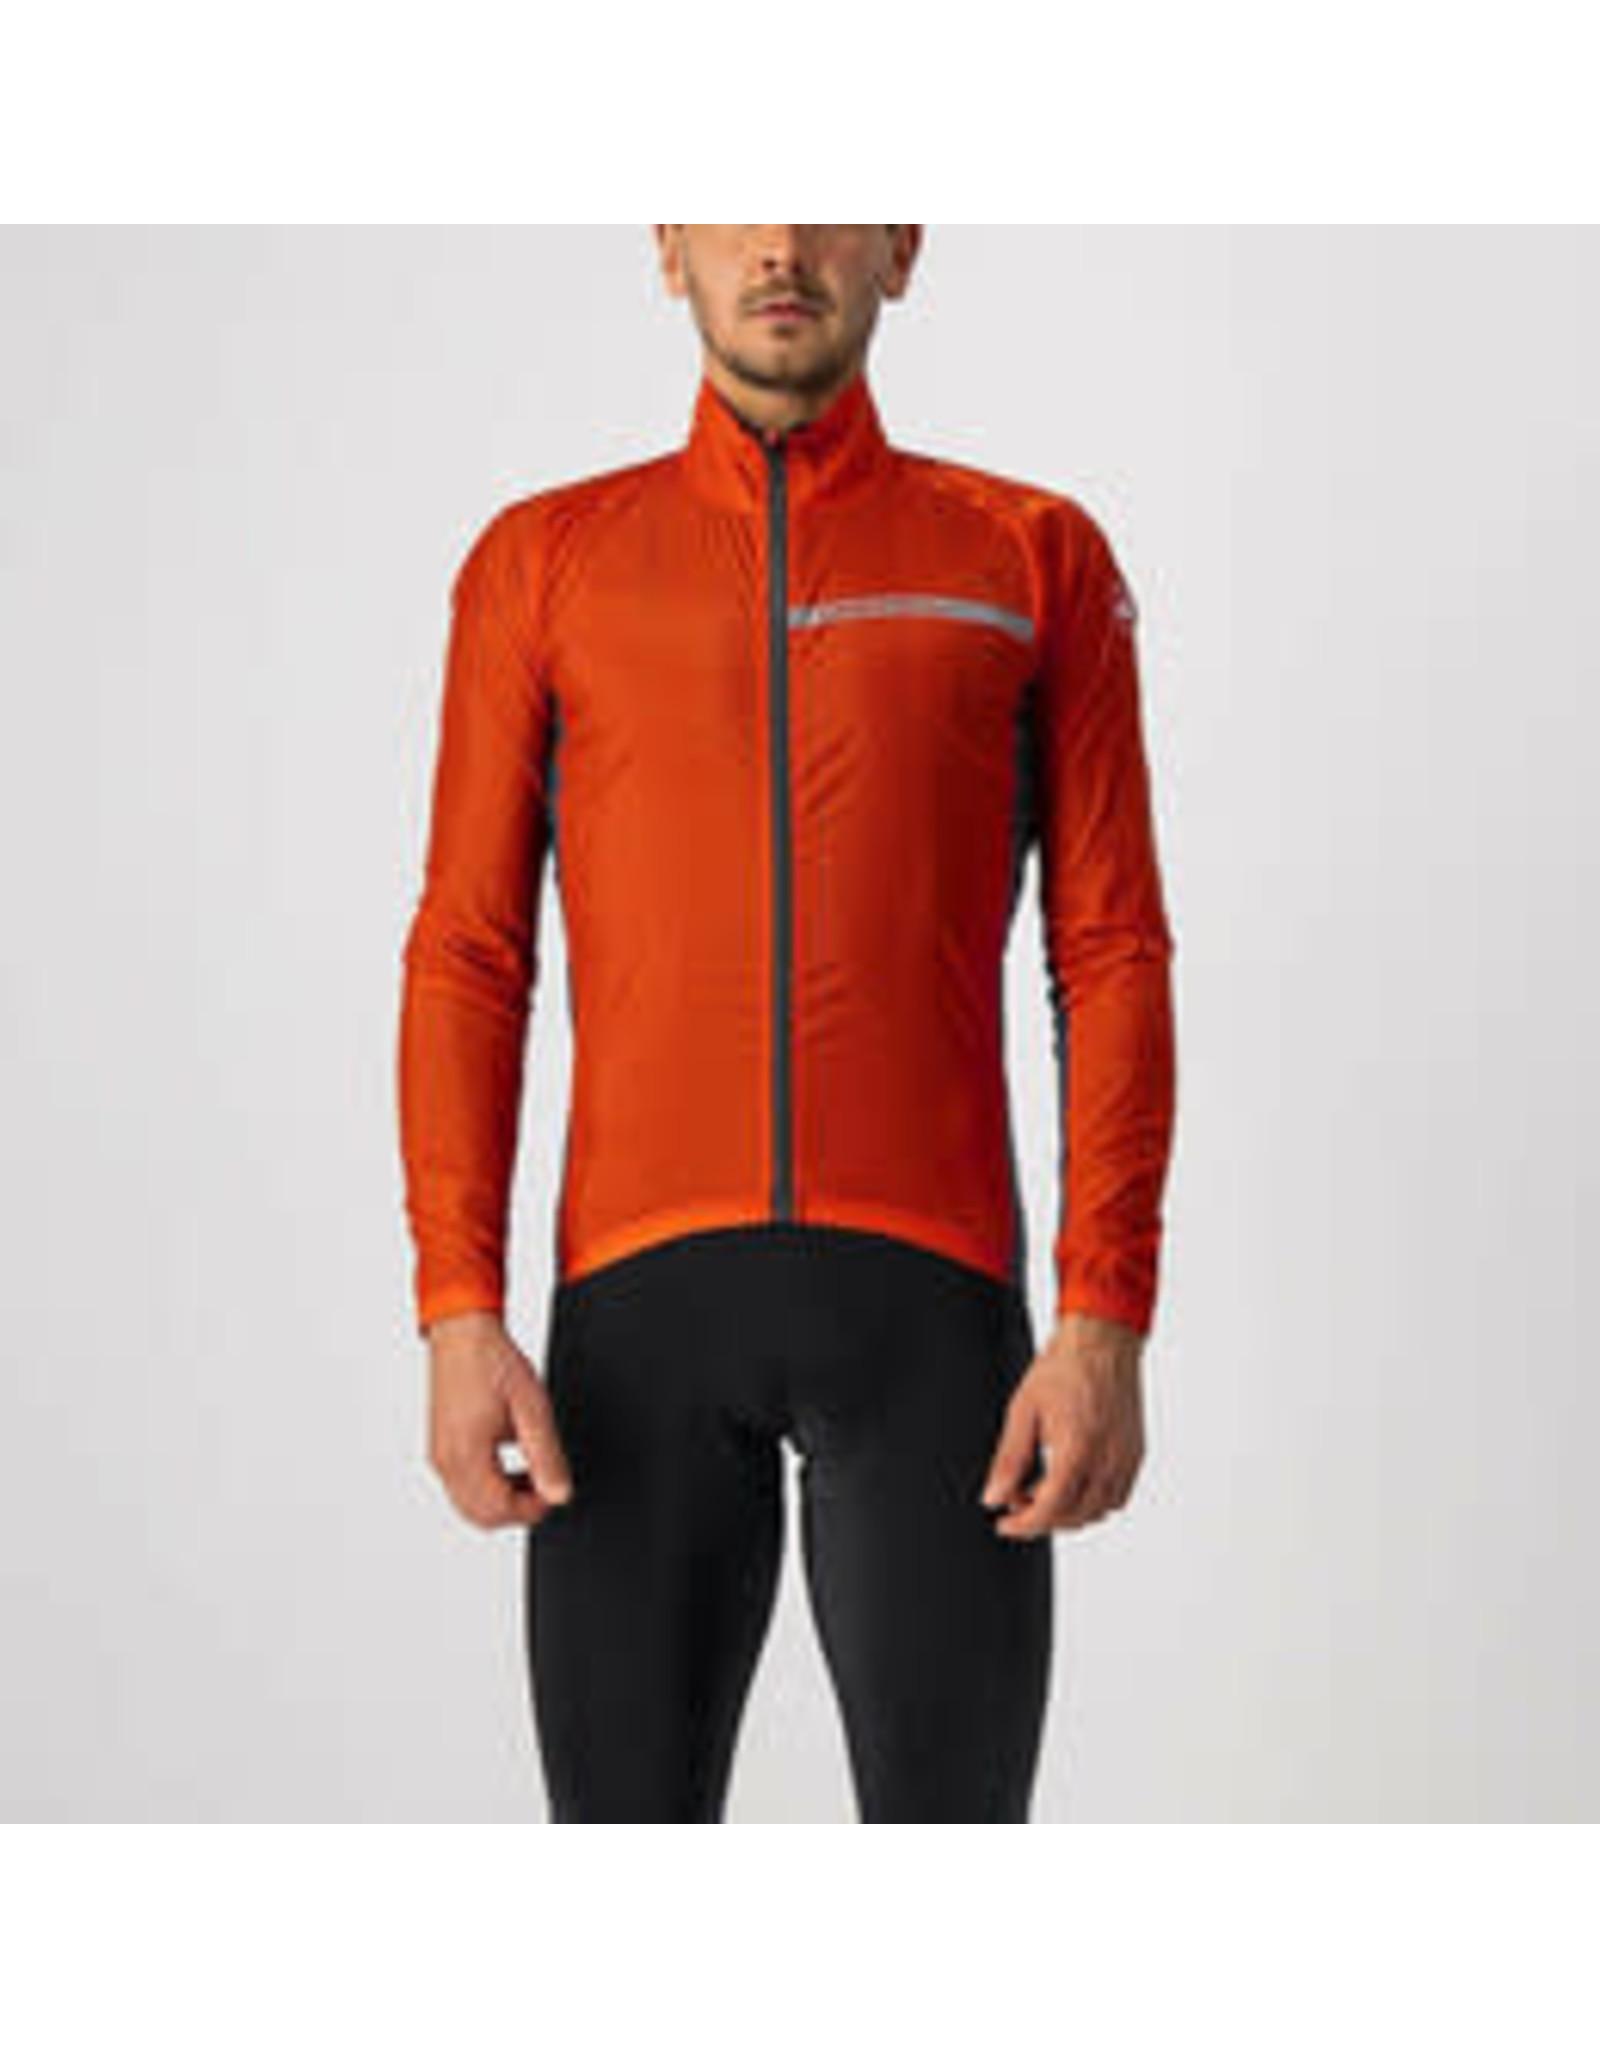 Castelli CASTELLI, Squadra Stretch Jacket, Men's